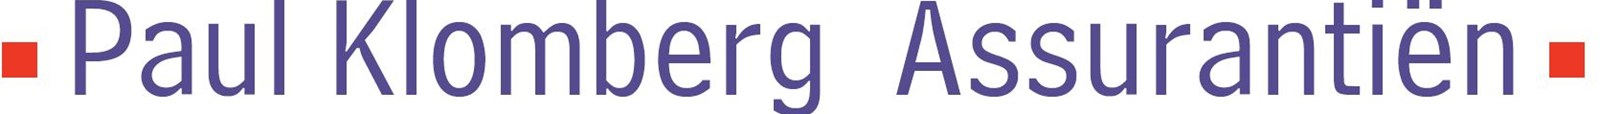 Logo van Paul Klomberg Assurantiën